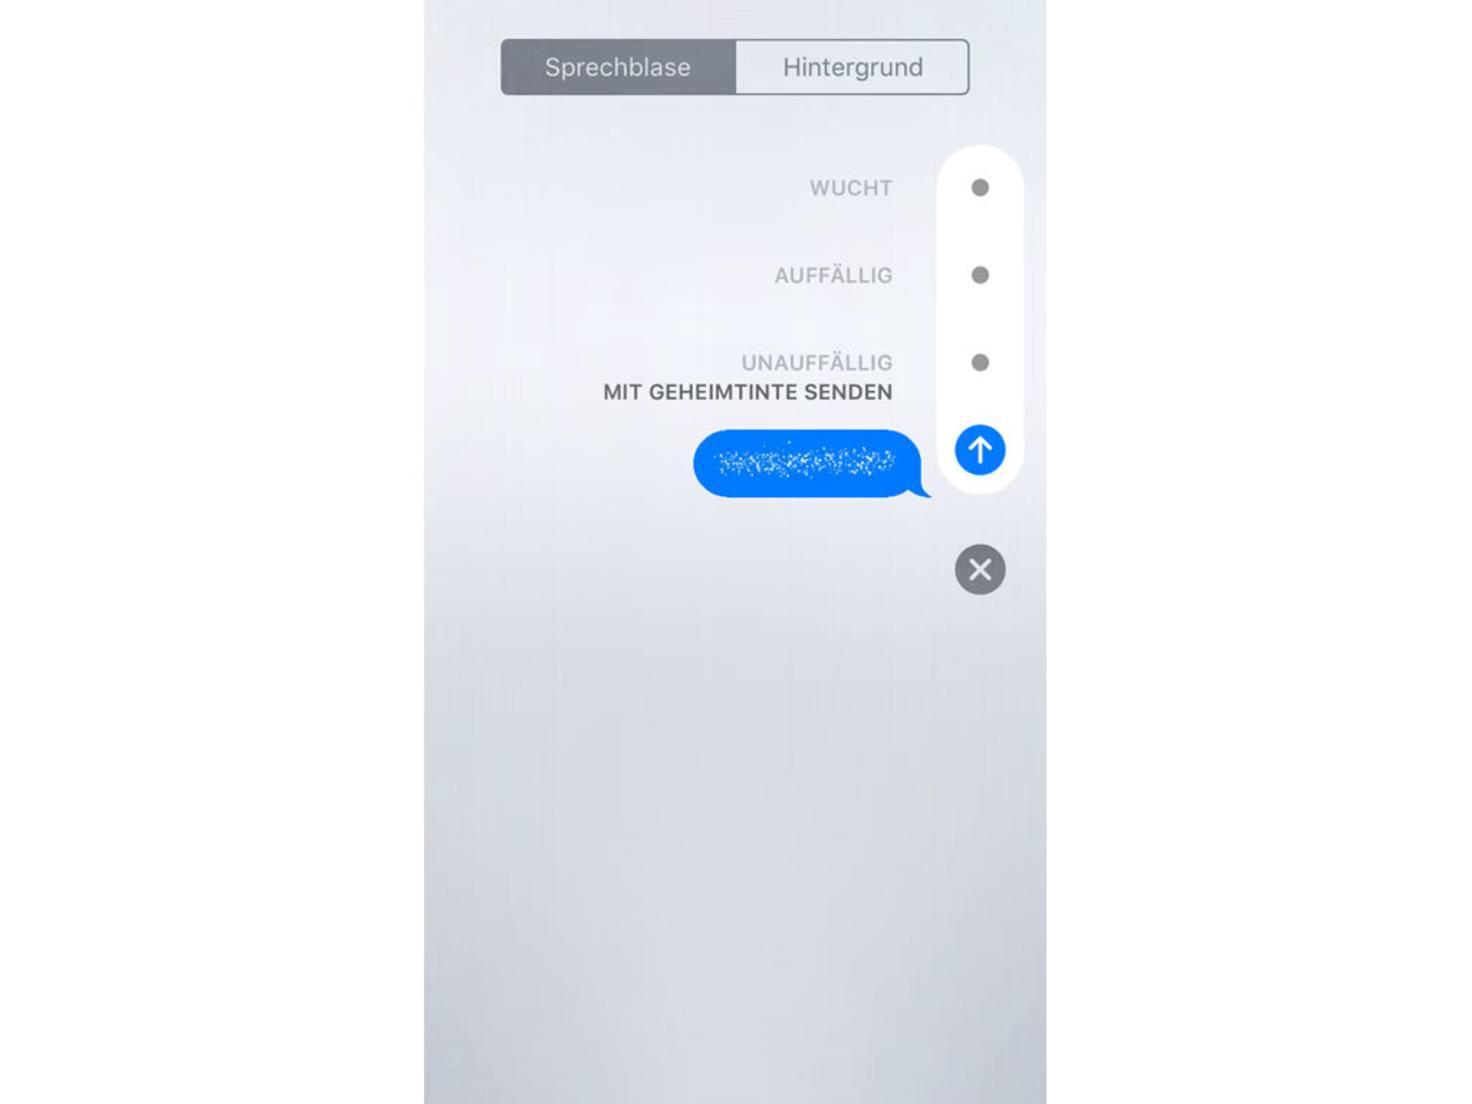 iOS 10 Geheimtinte